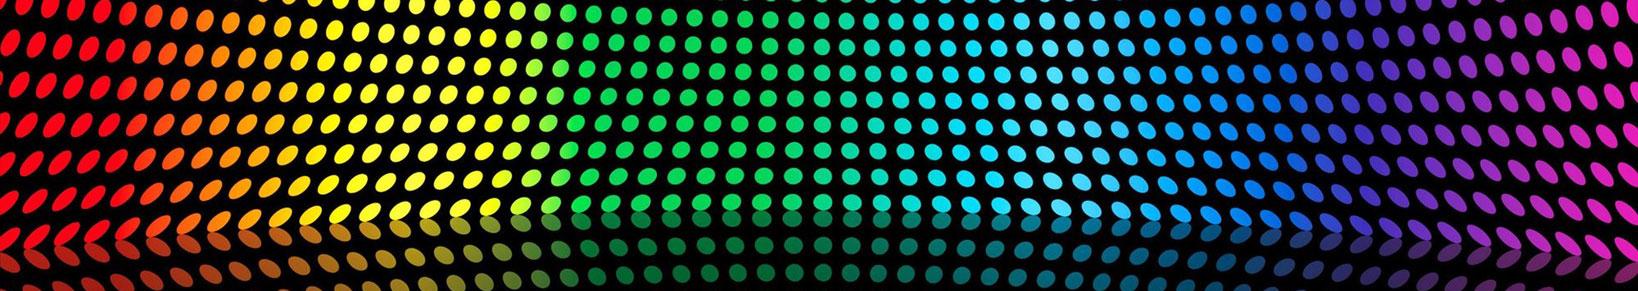 -spectrum-water-droplet-tablet-phone-wallpaper-background-equalizer-c-e-ibackgroundz.com